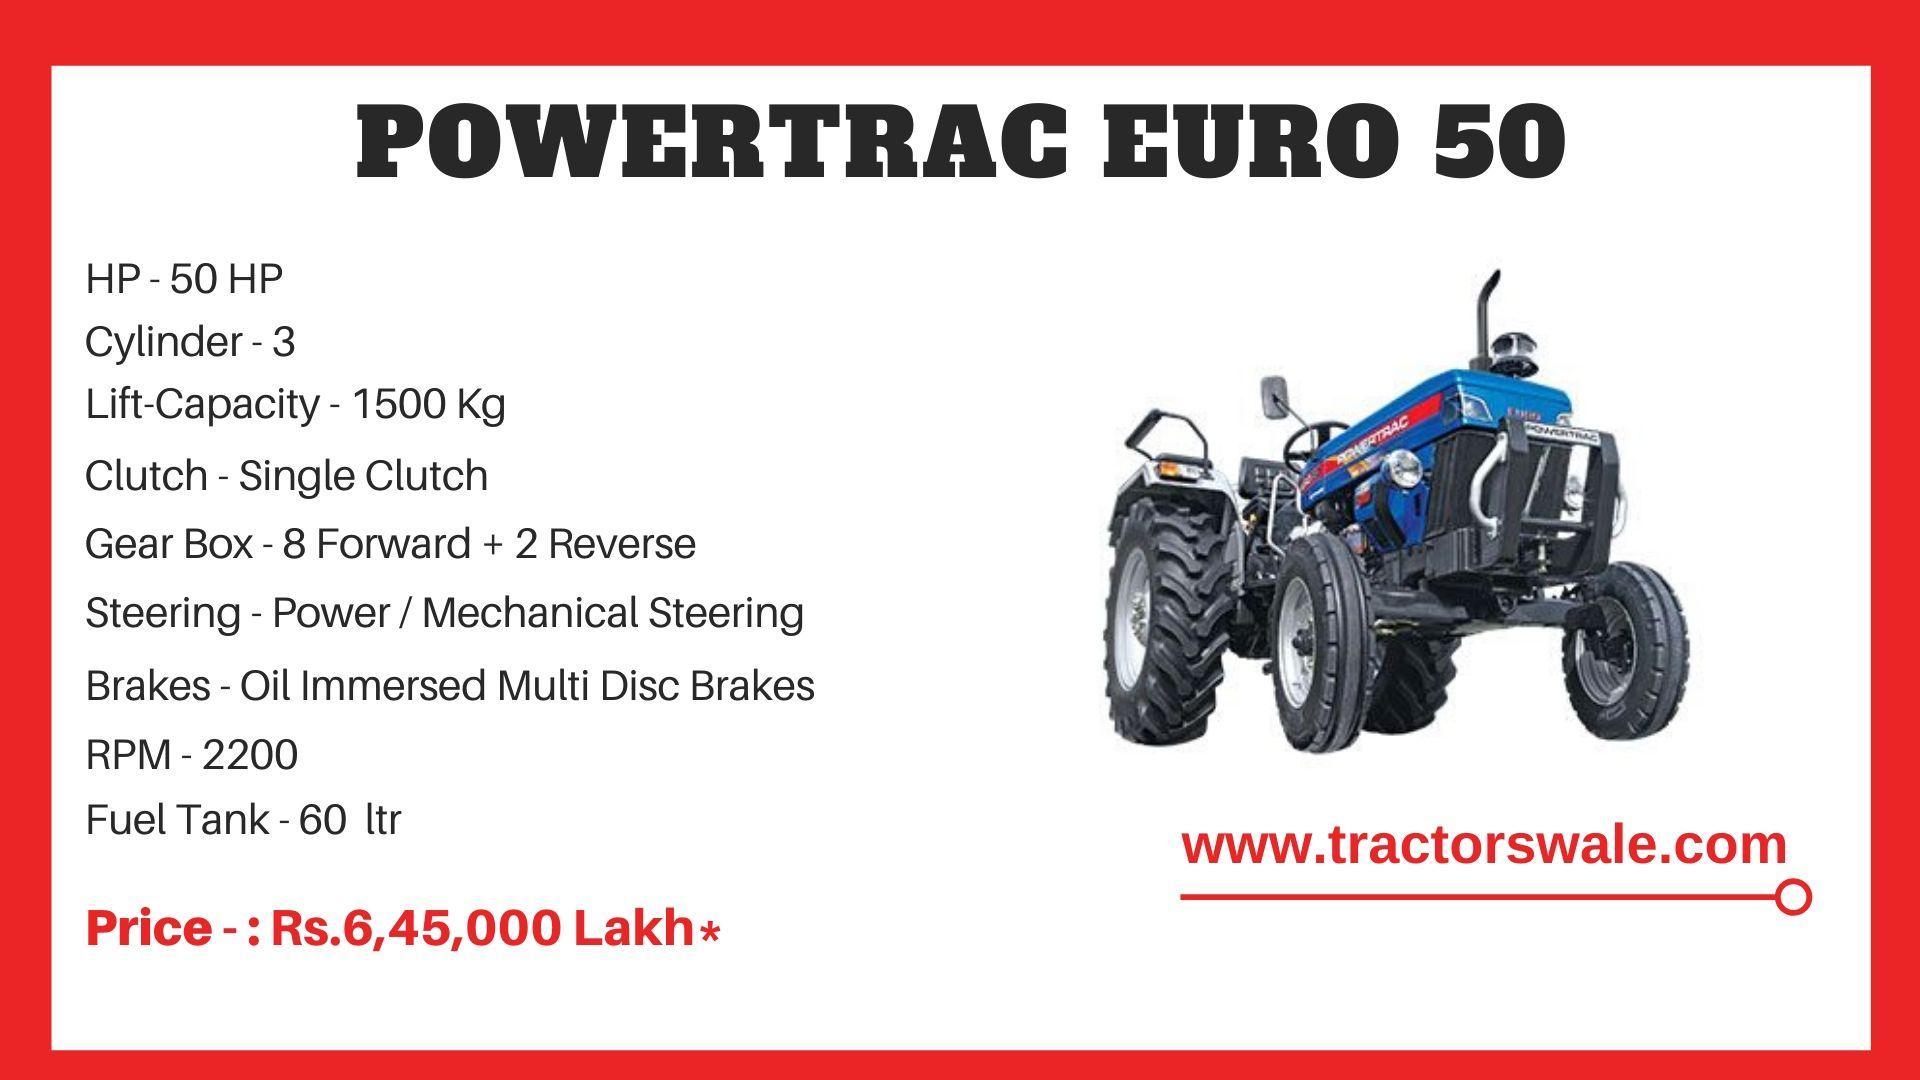 PowerTrac Euro 50 tractor price